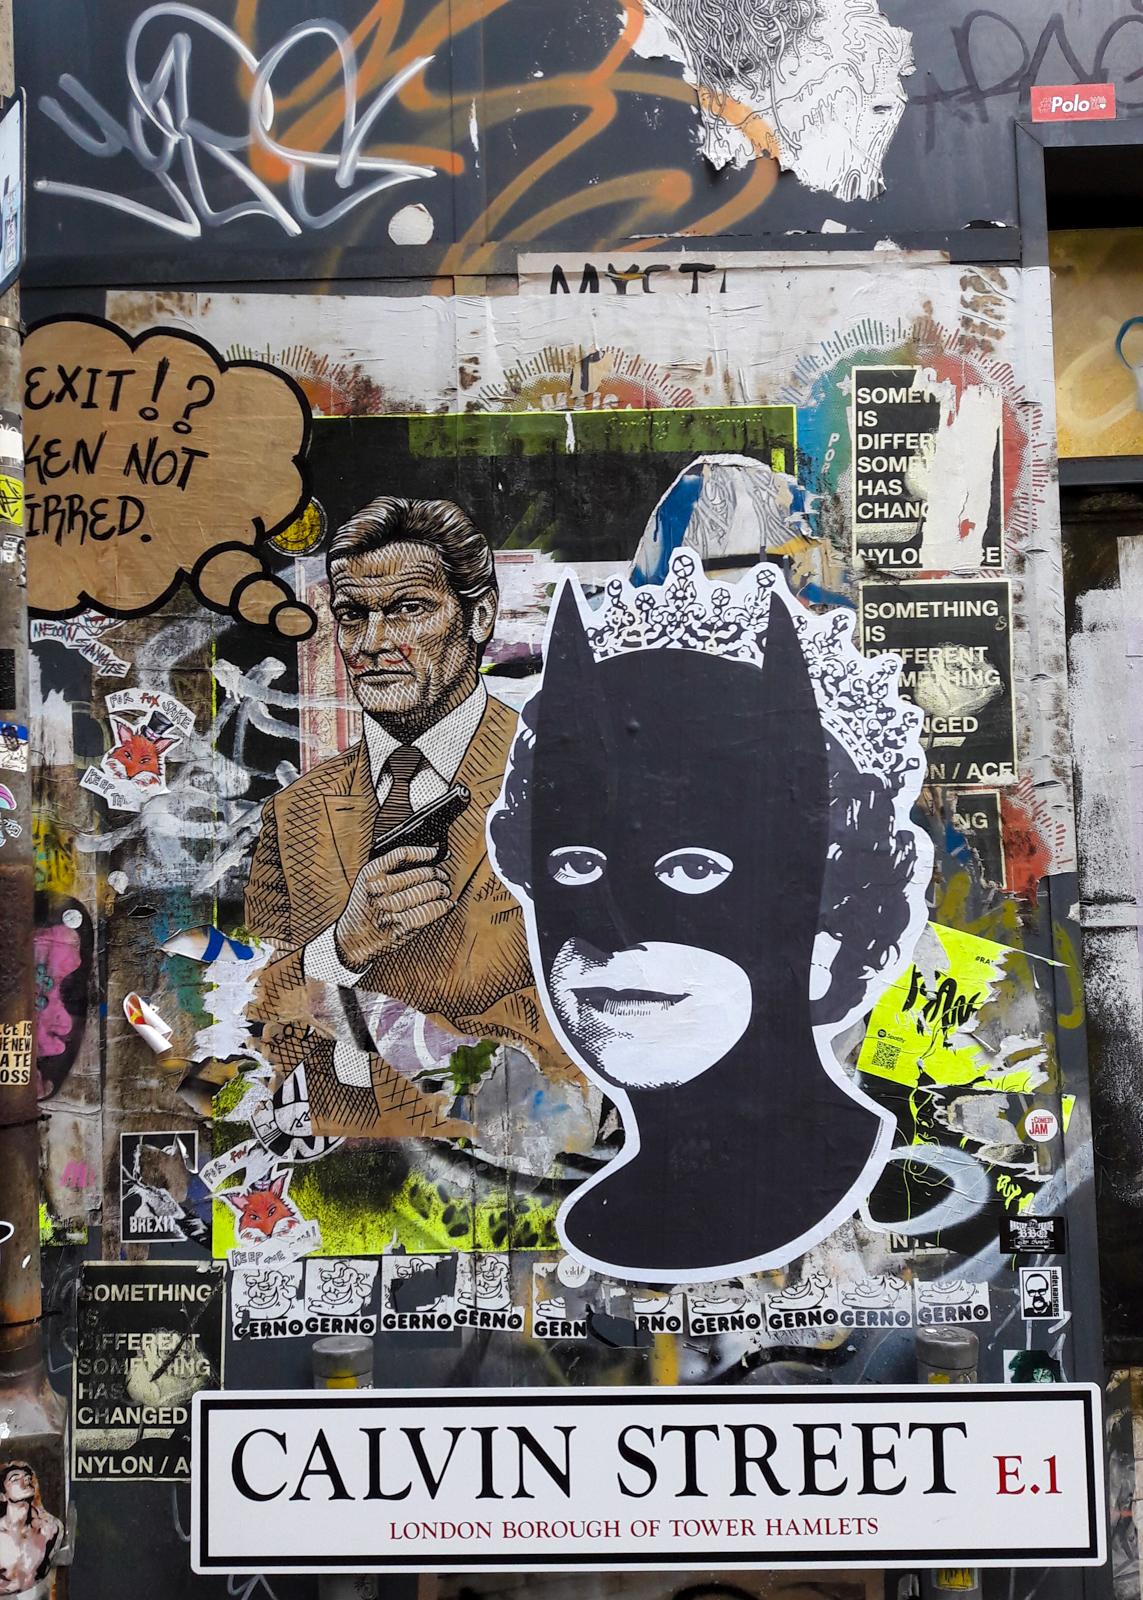 shoreditch londres, street art londres, street art london, street art shoreditch